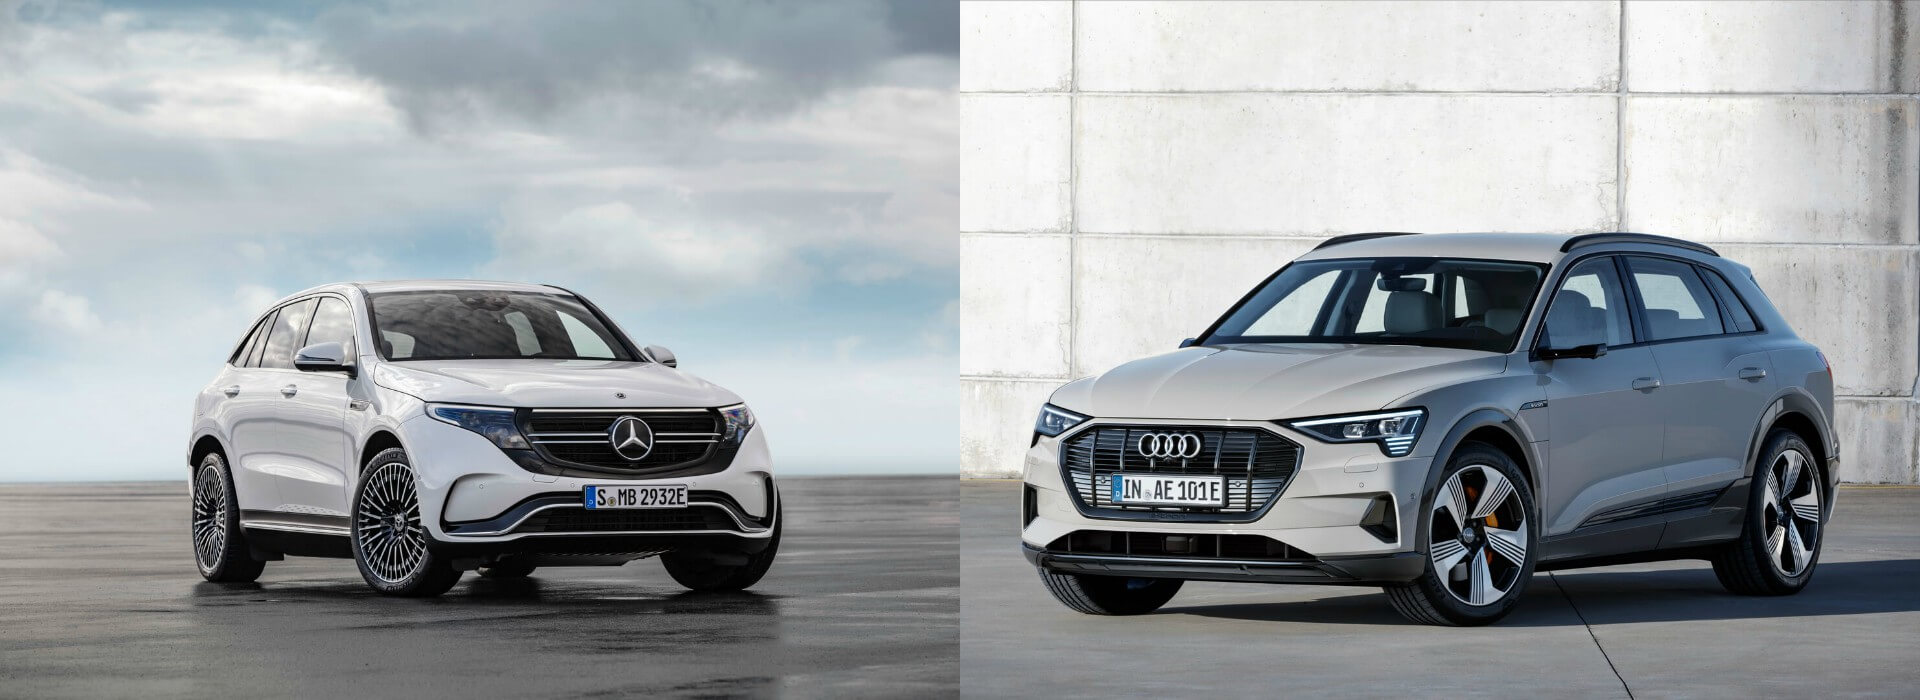 Электрический кроссовер Mercedes-Benz EQC и Audi e-tron quattro